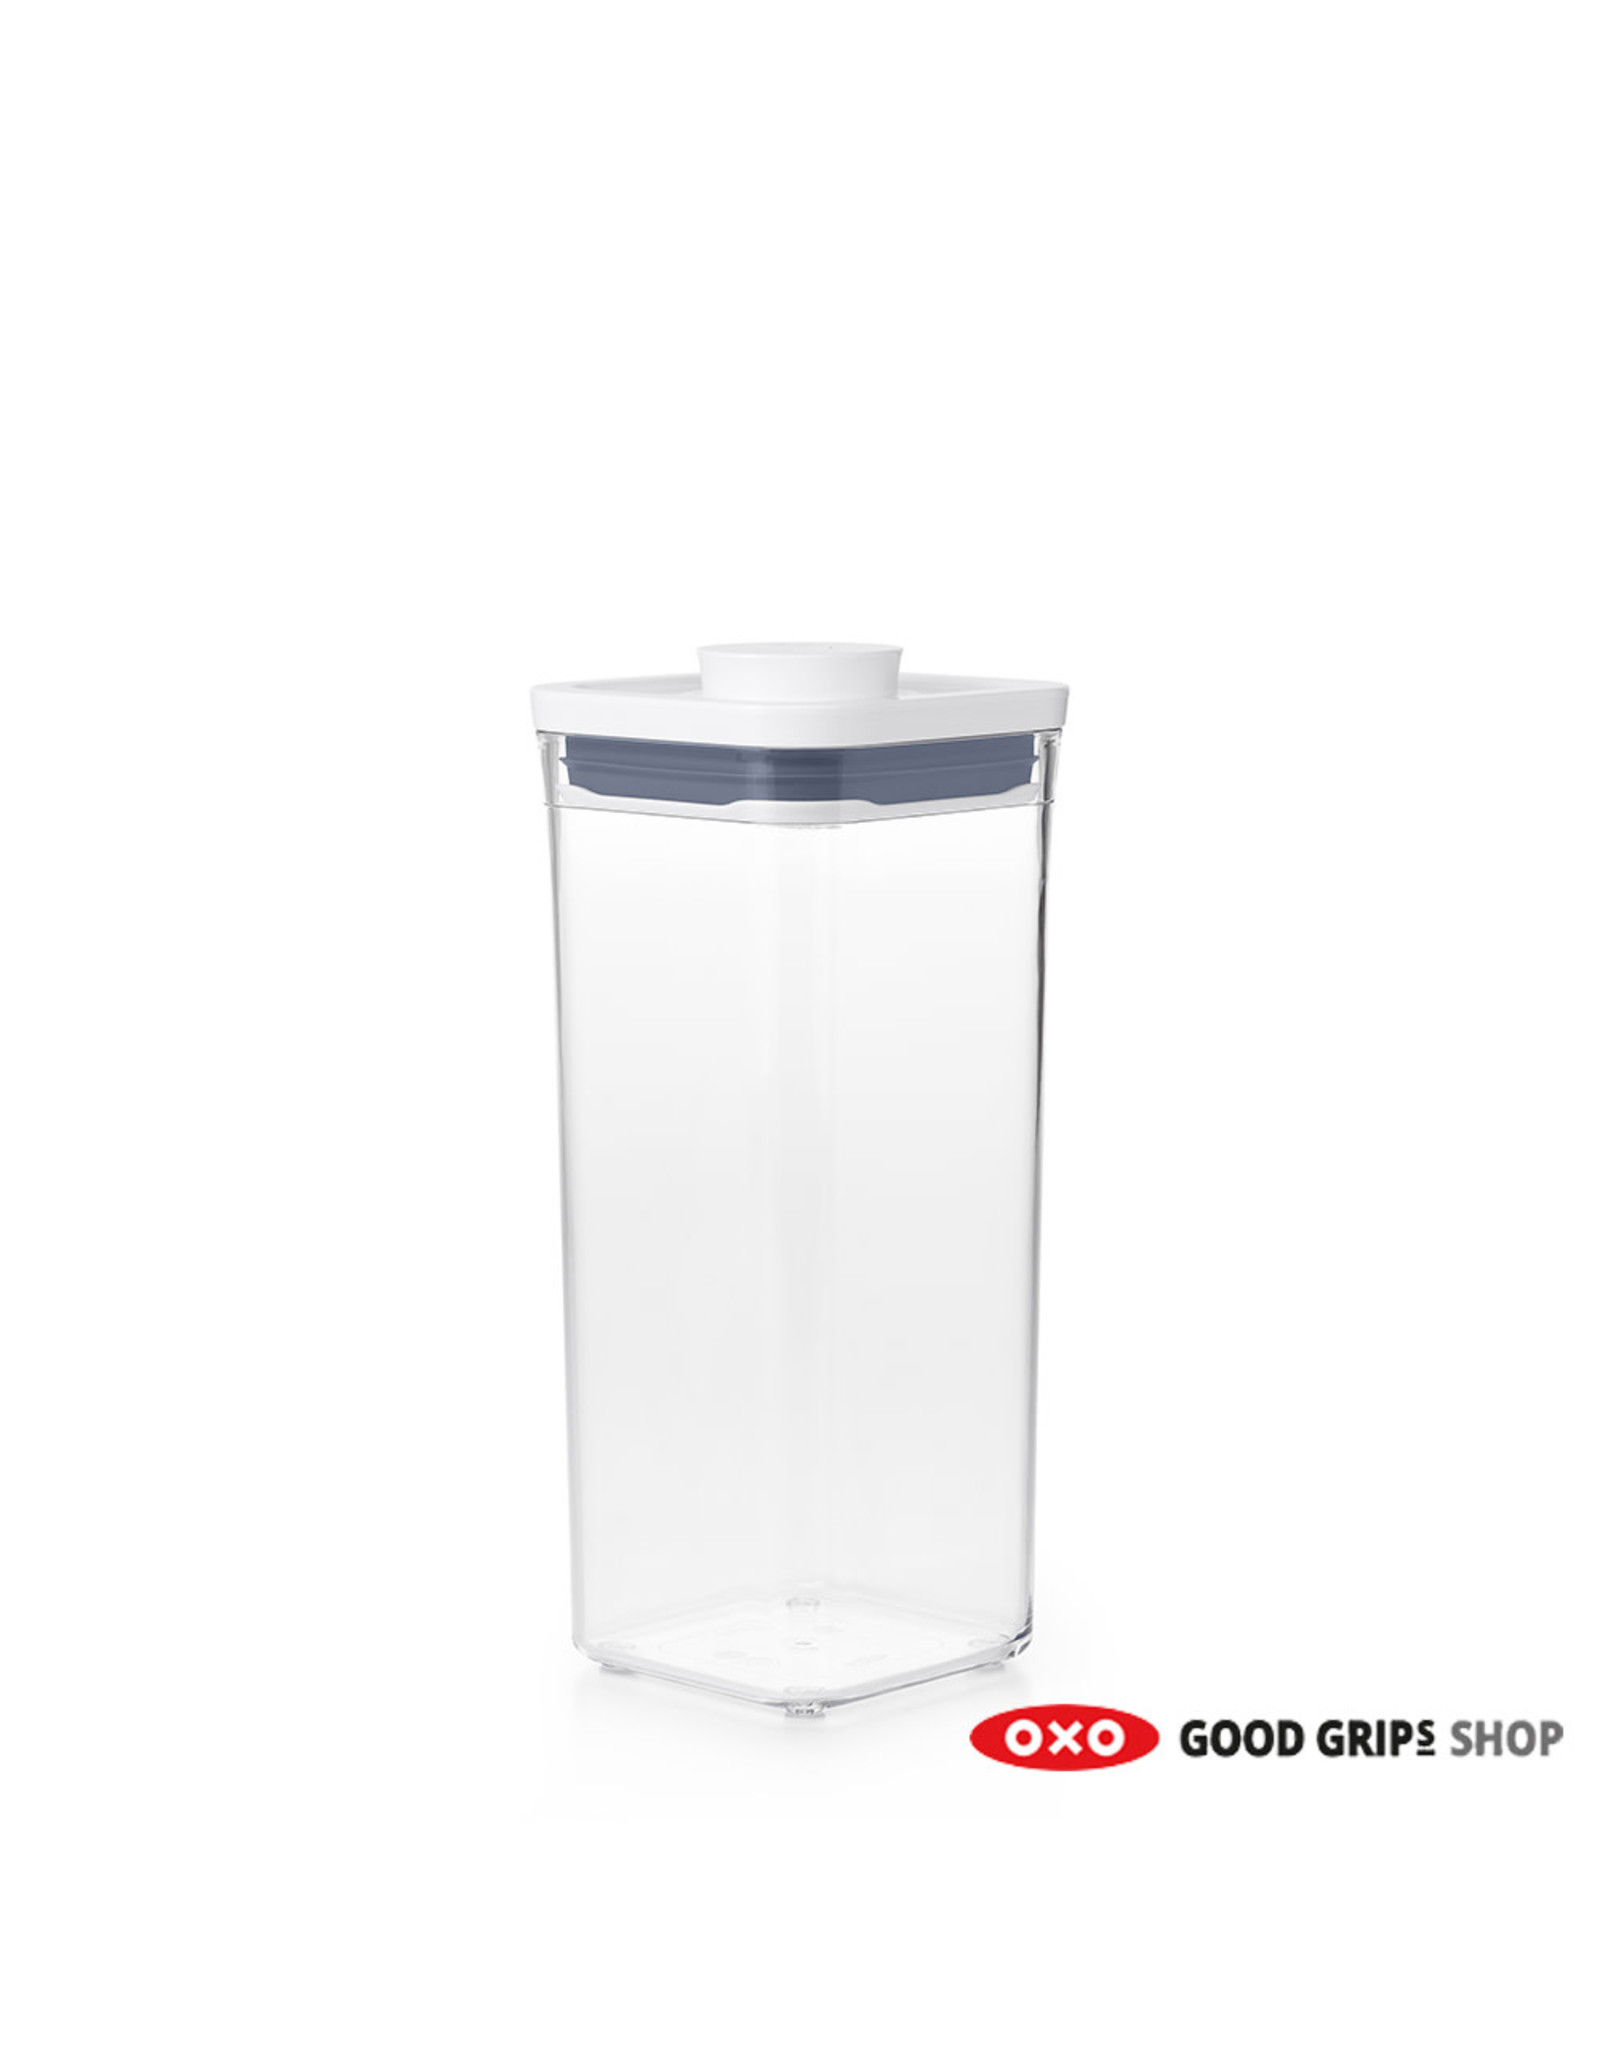 oxo OXO. POP 2.0 Klein vierkant medium, 1,6 liter